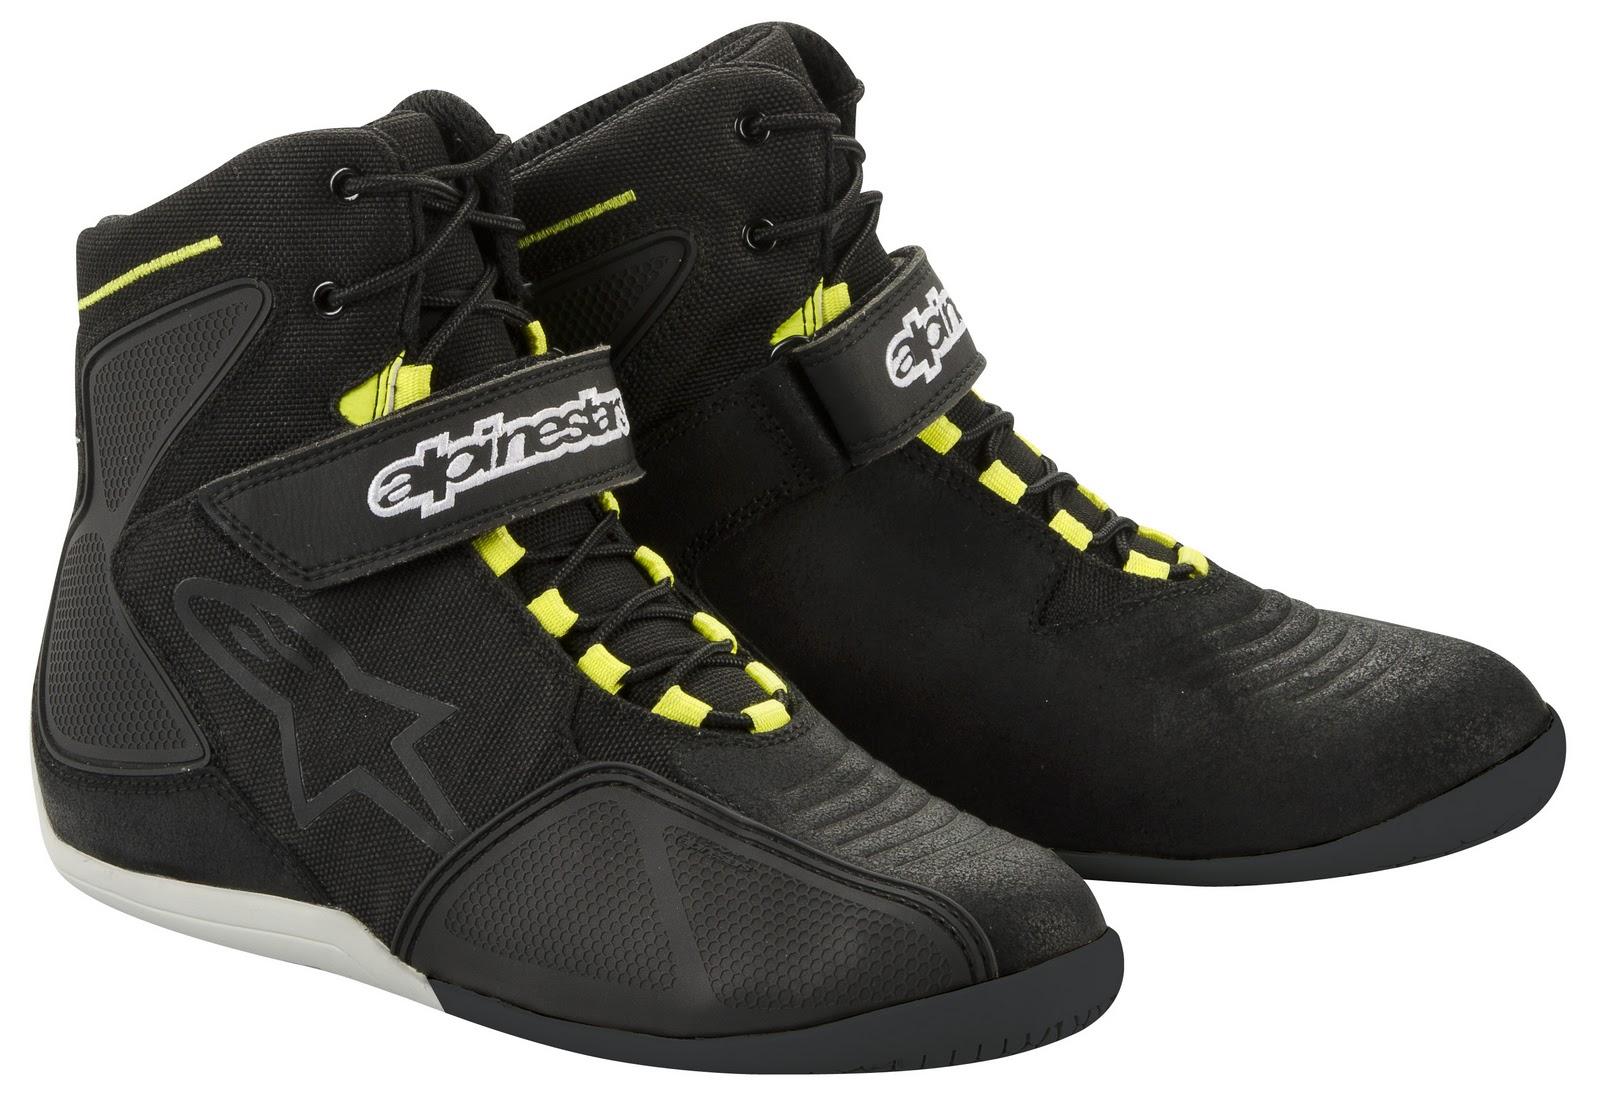 http://1.bp.blogspot.com/-NdSrKmgmO1w/TxnKqHTpANI/AAAAAAAACpk/zNu4Przh4XU/s1600/fastback+black+yellow.jpg